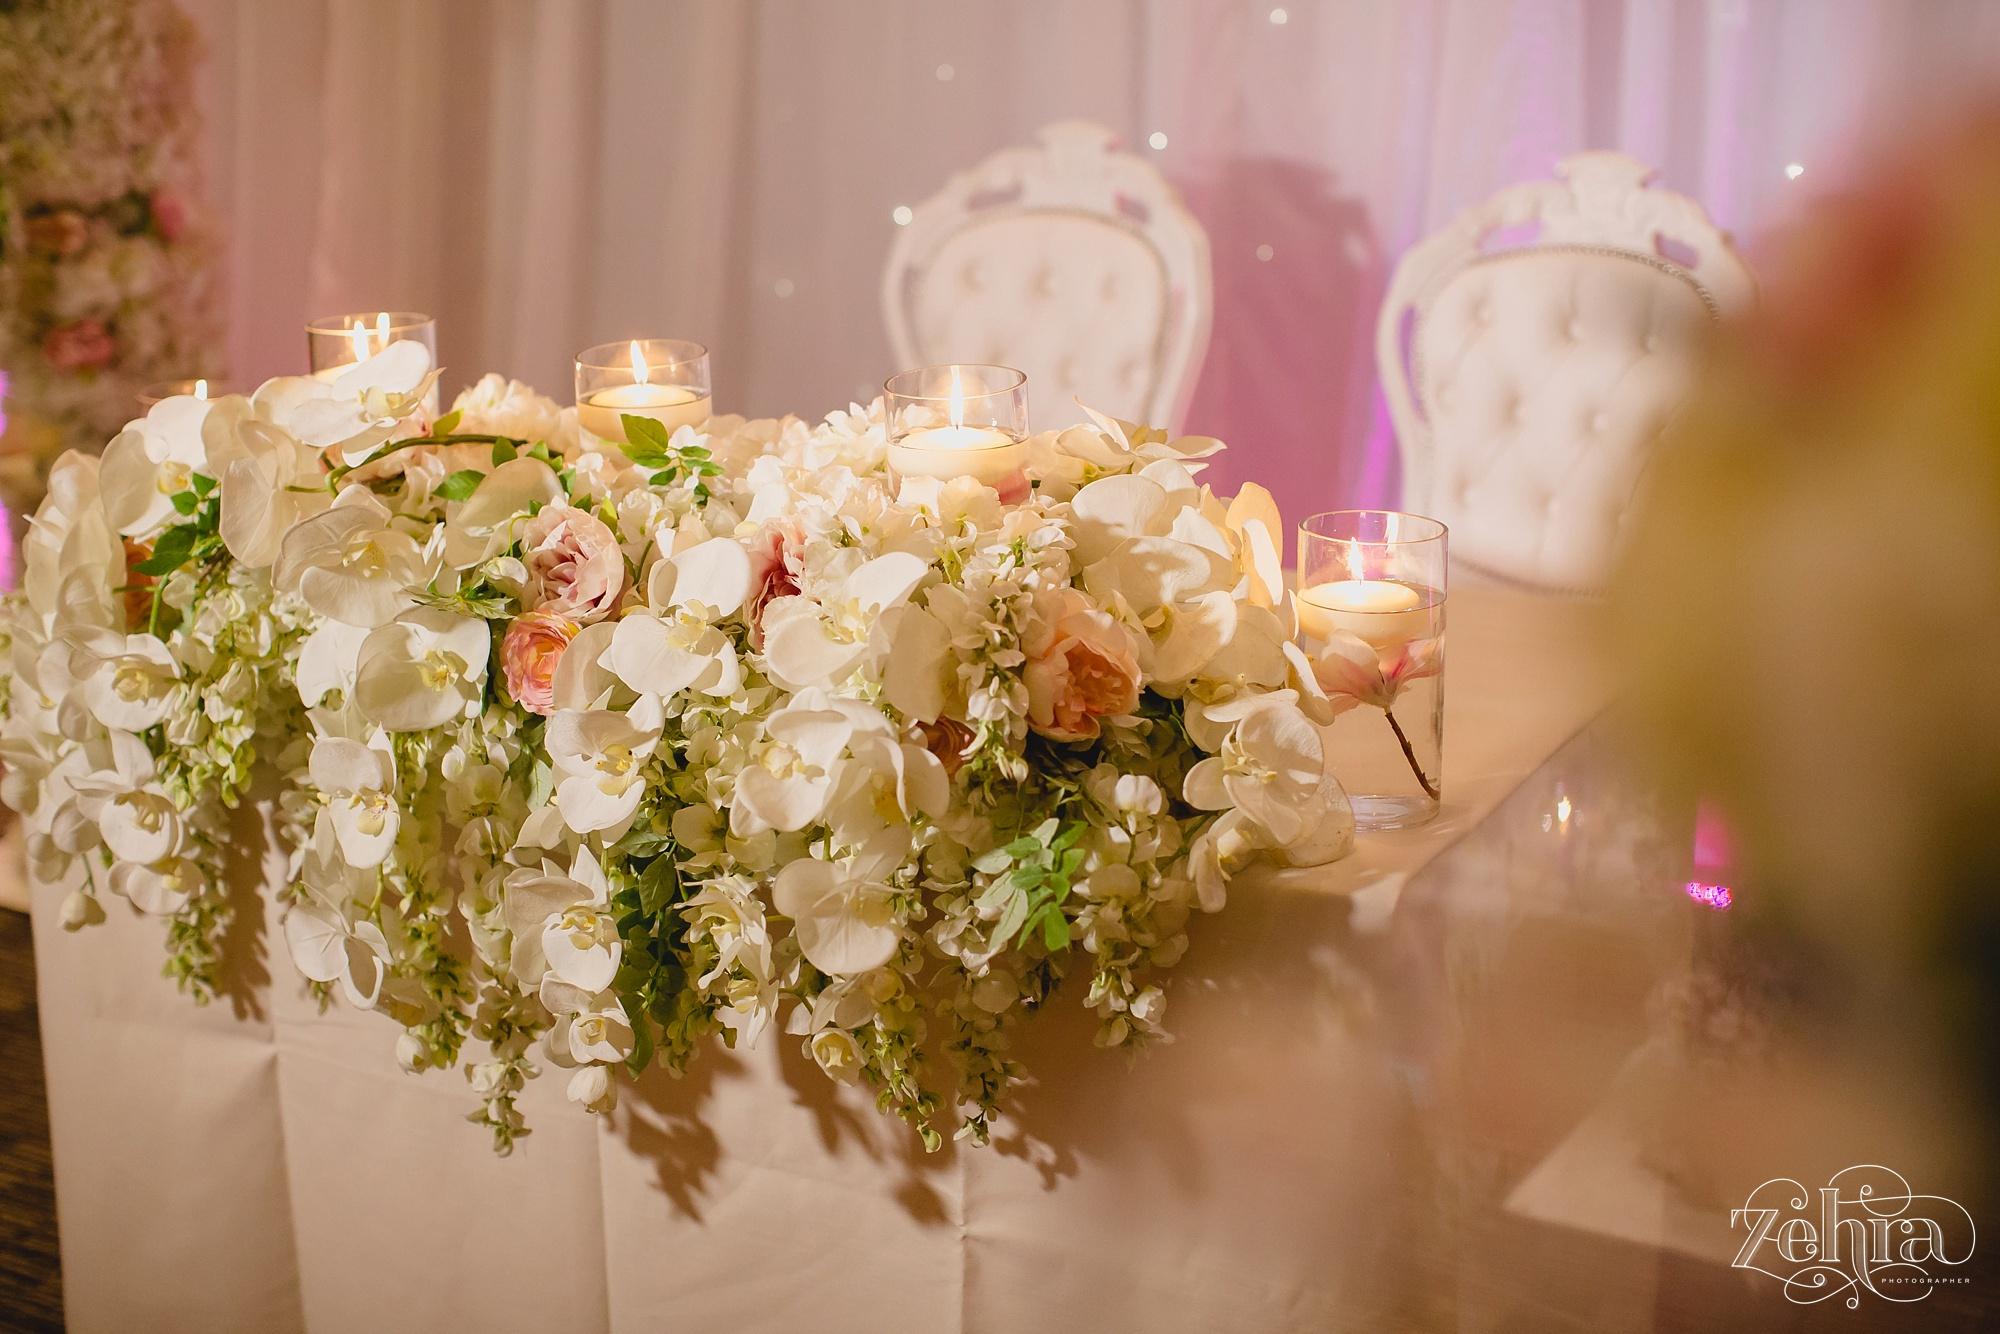 zehra photographer mere cheshire wedding_0007.jpg